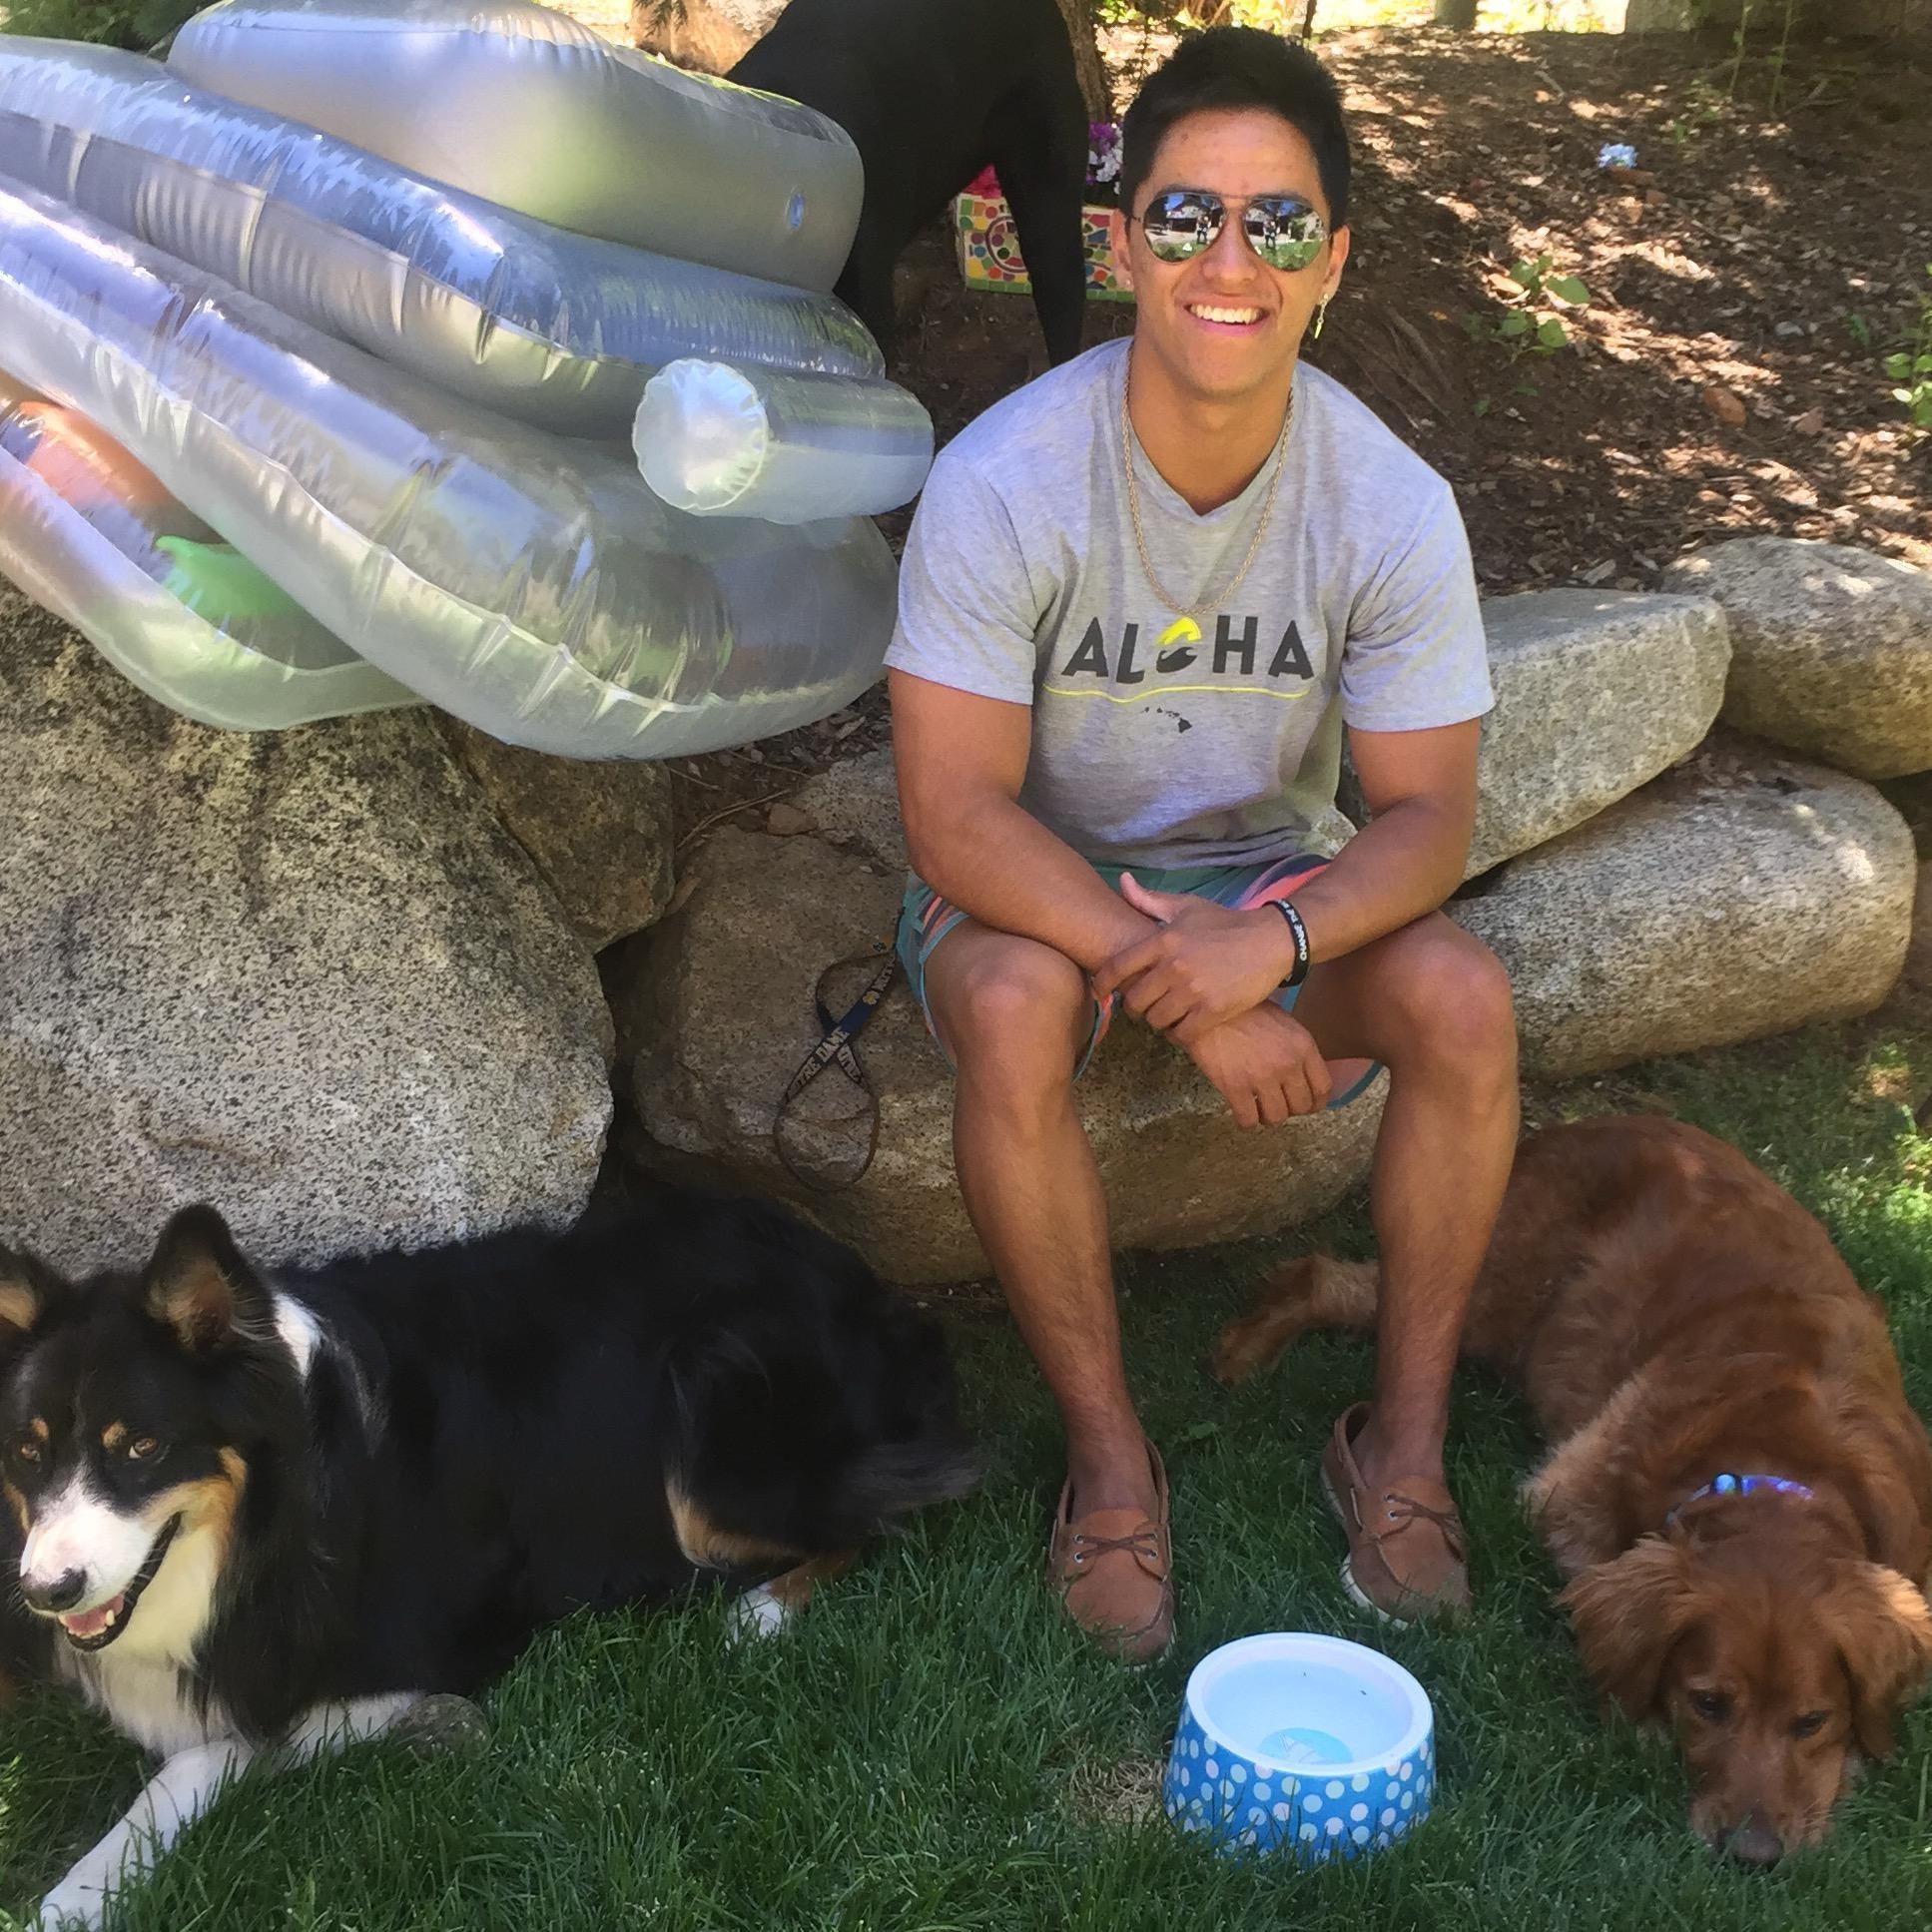 Jacob's dog day care